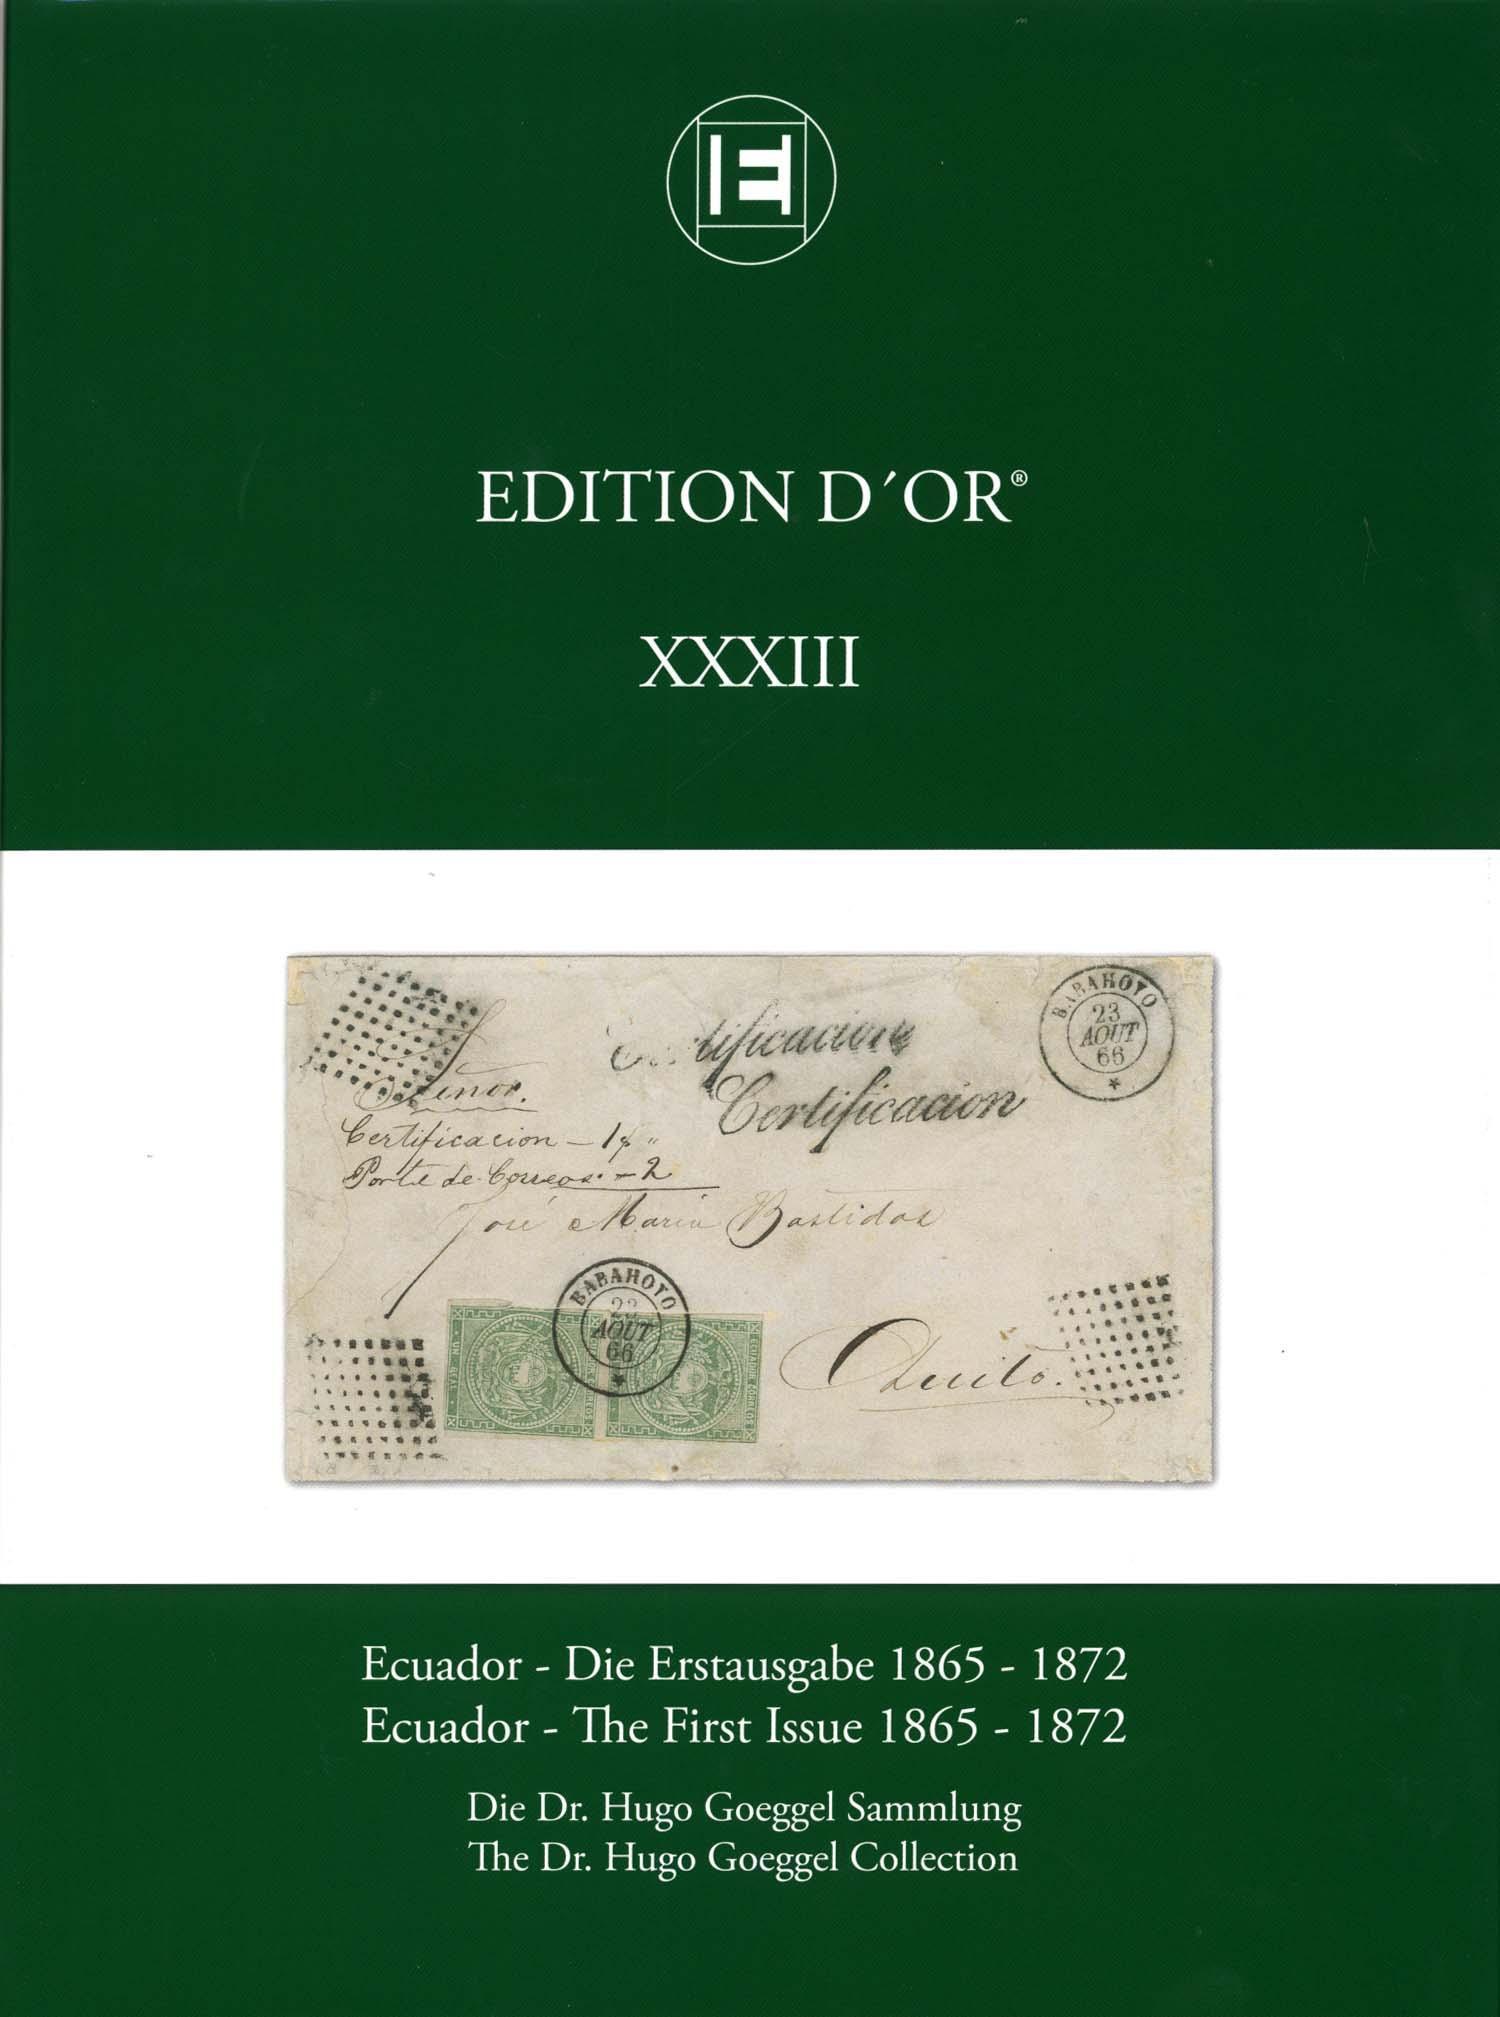 Vol. 33: Ecuador - The First Issue 1865-1872 • The Dr. Hugo Goeggel Collection